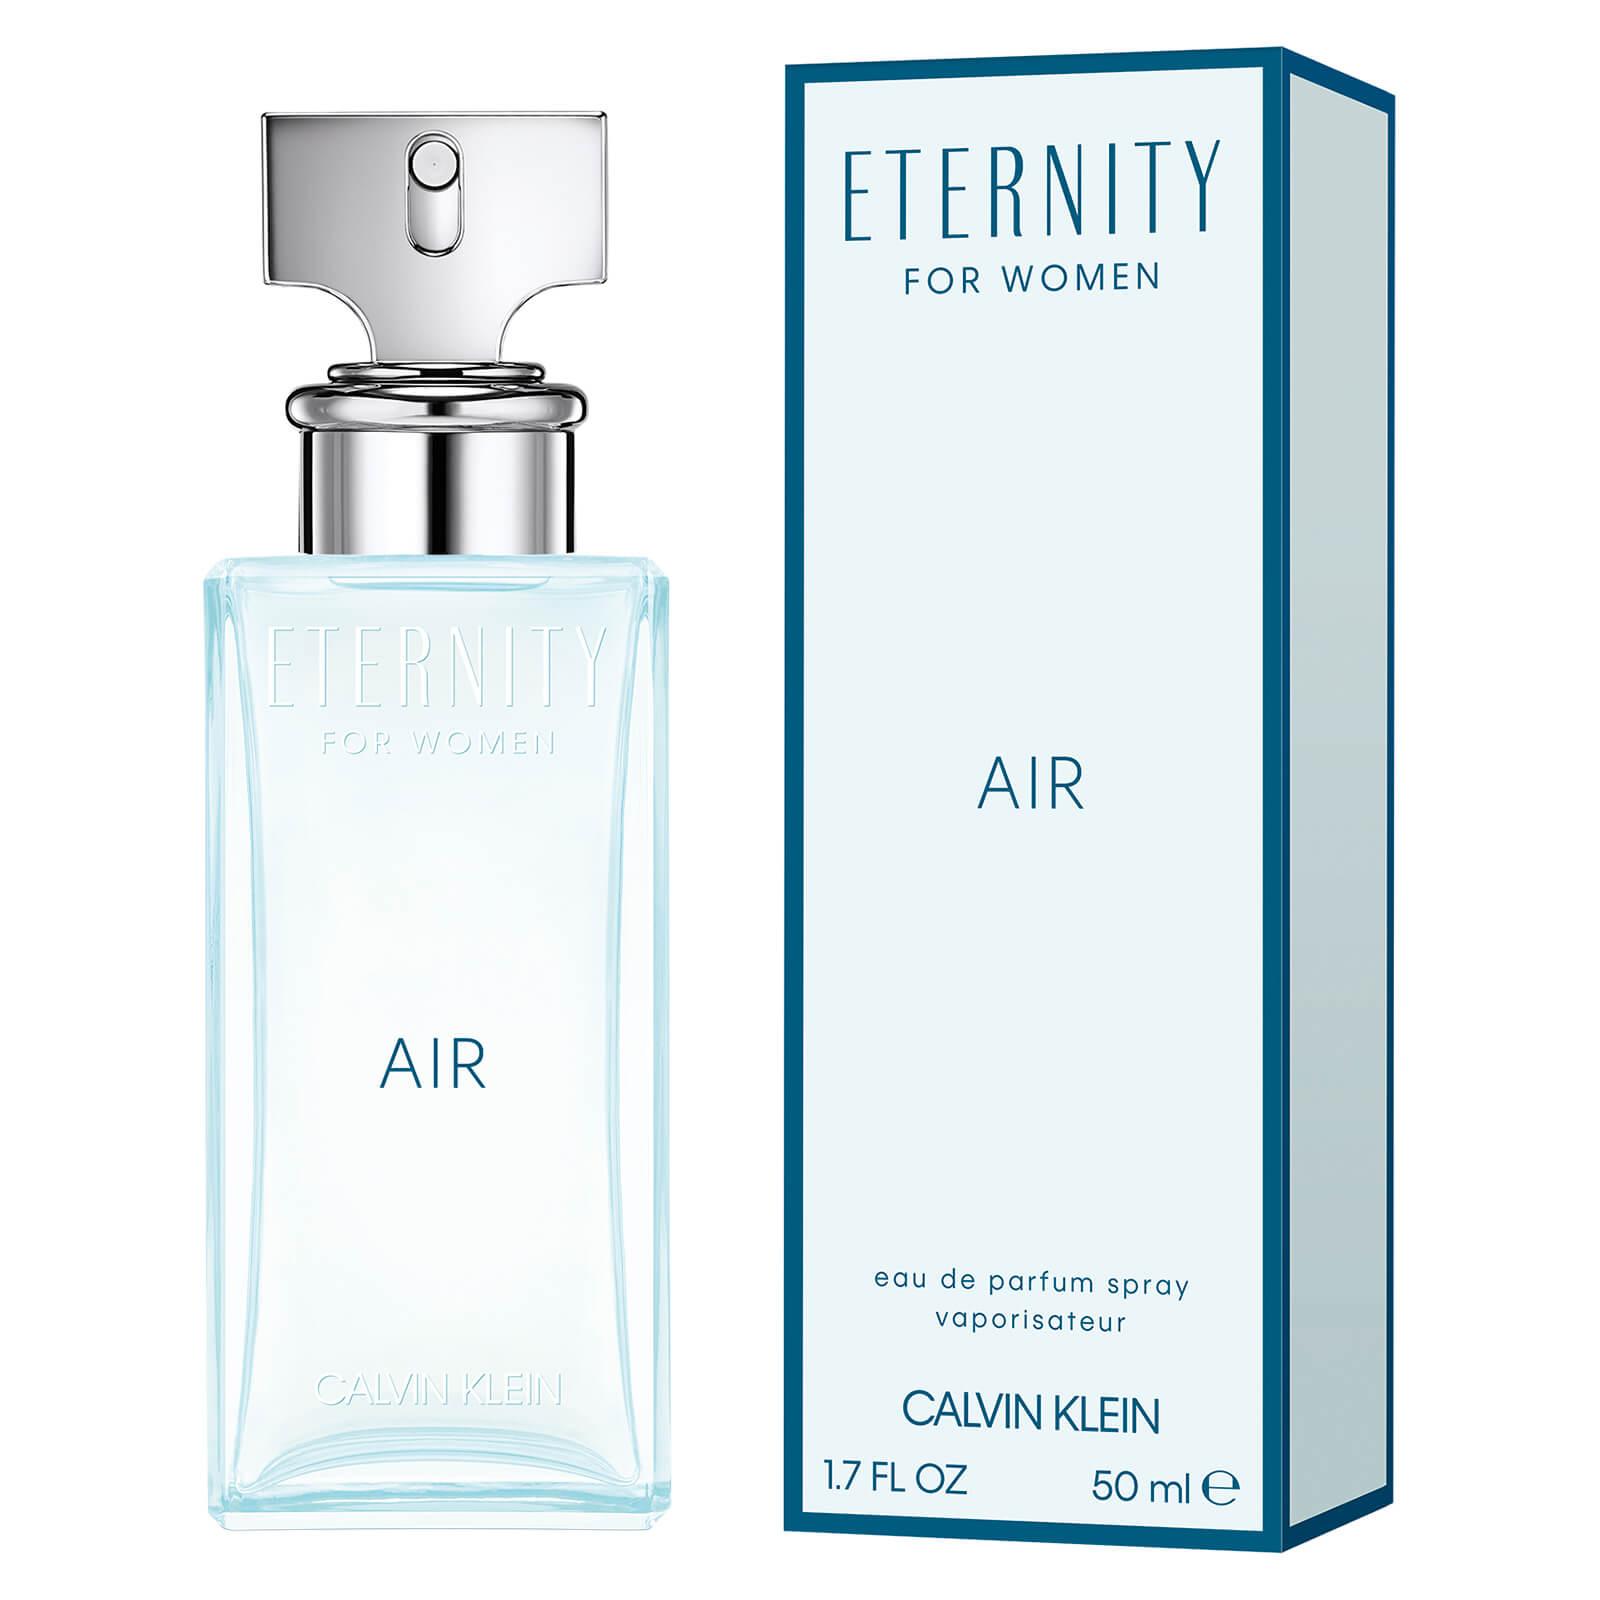 Calvin Klein Eternity Air For Woman 50ml Edp Free Shipping Chance Parfums Miniature Parfum Gift Set Description